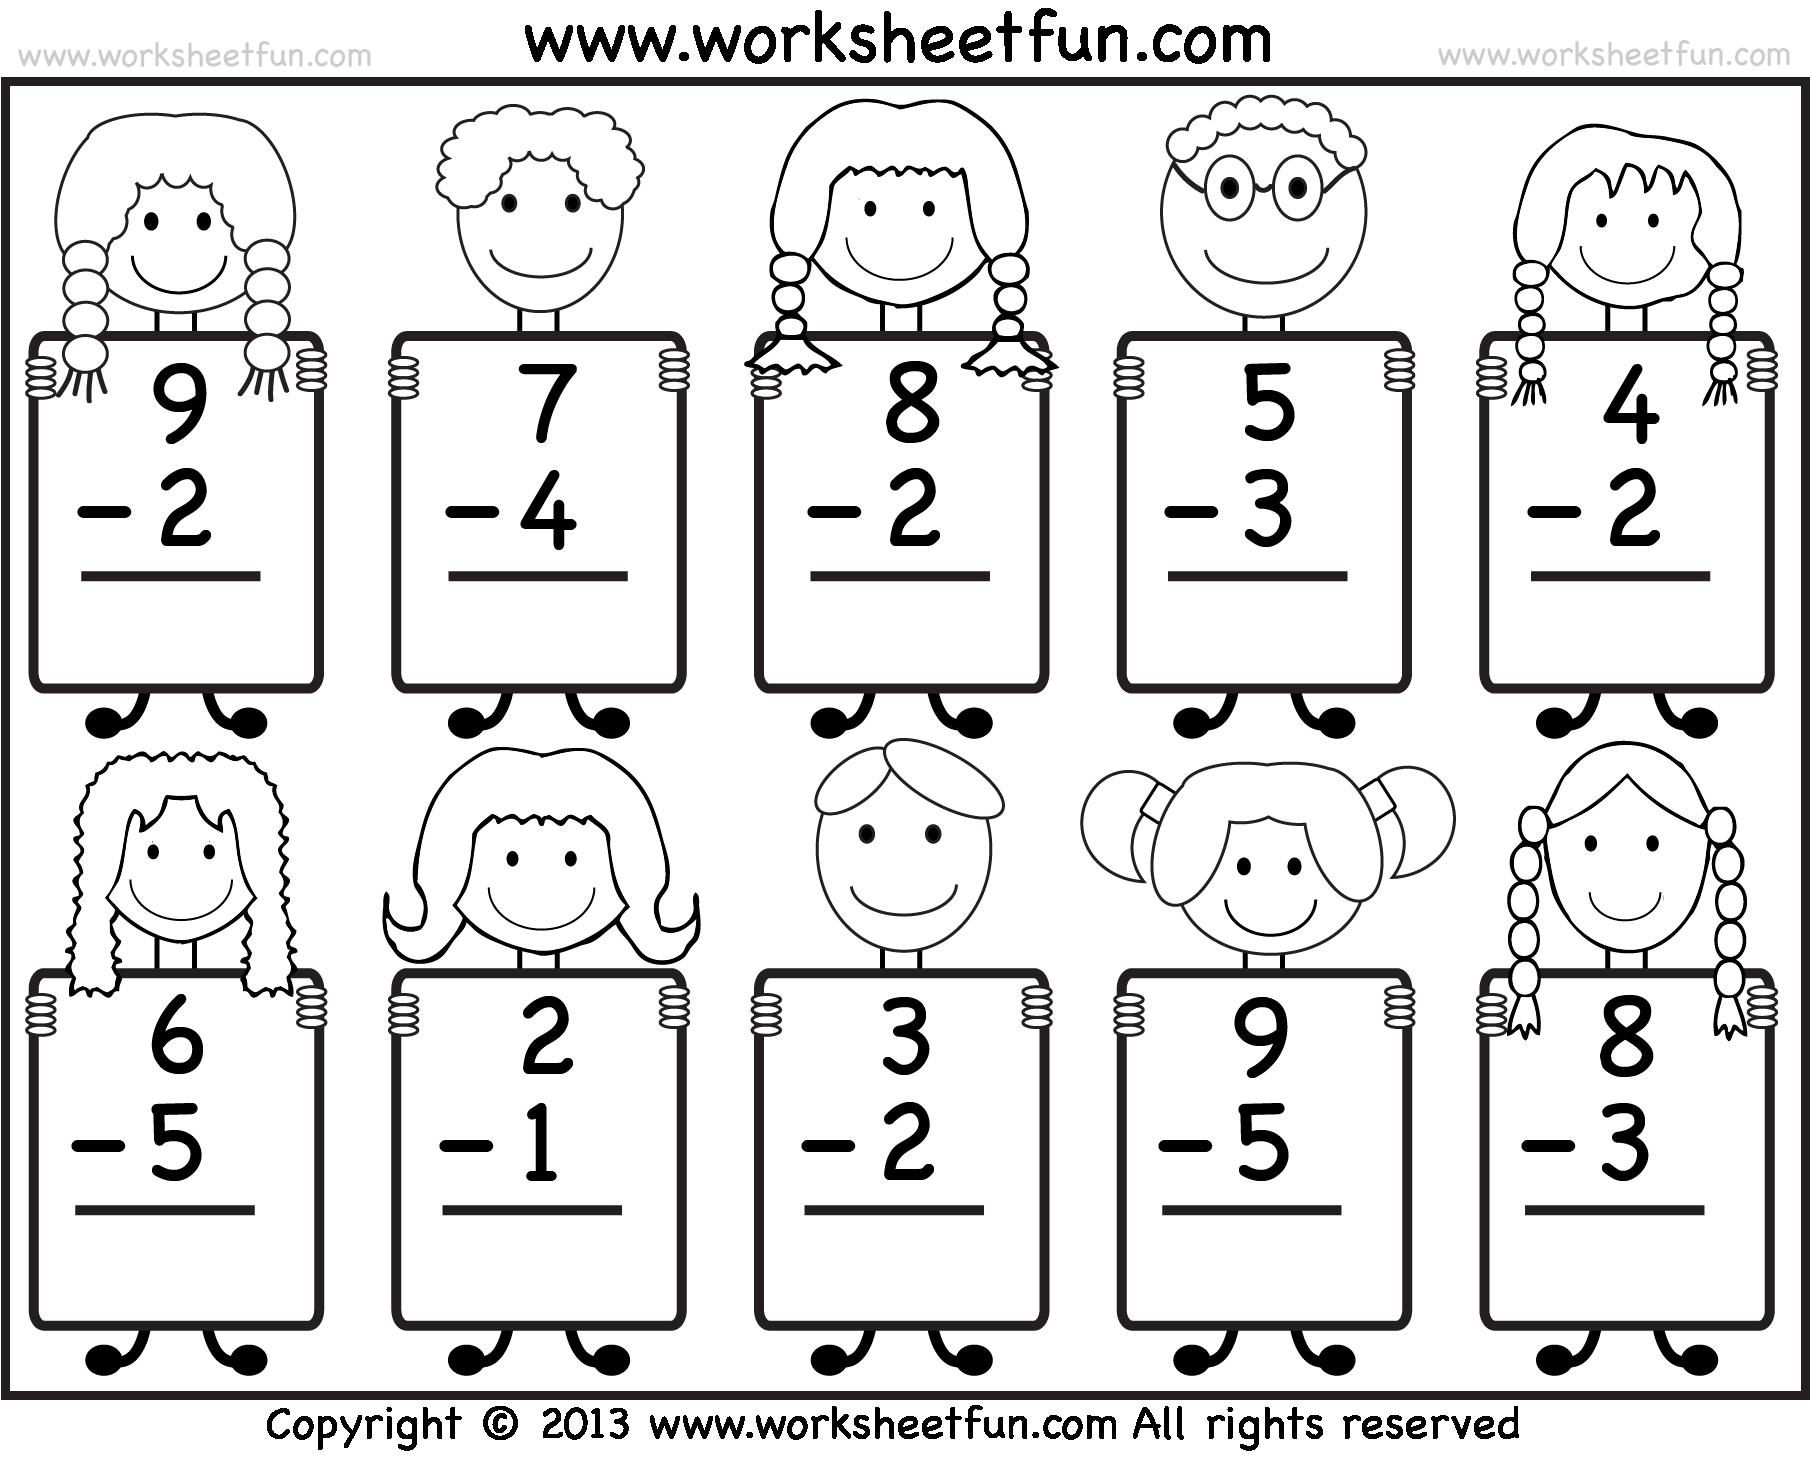 Beginner Subtraction 10 Worksheets Free Printable Worksheets Worksheetfu Addition Kindergarten Kindergarten Addition Worksheets 1st Grade Math Worksheets